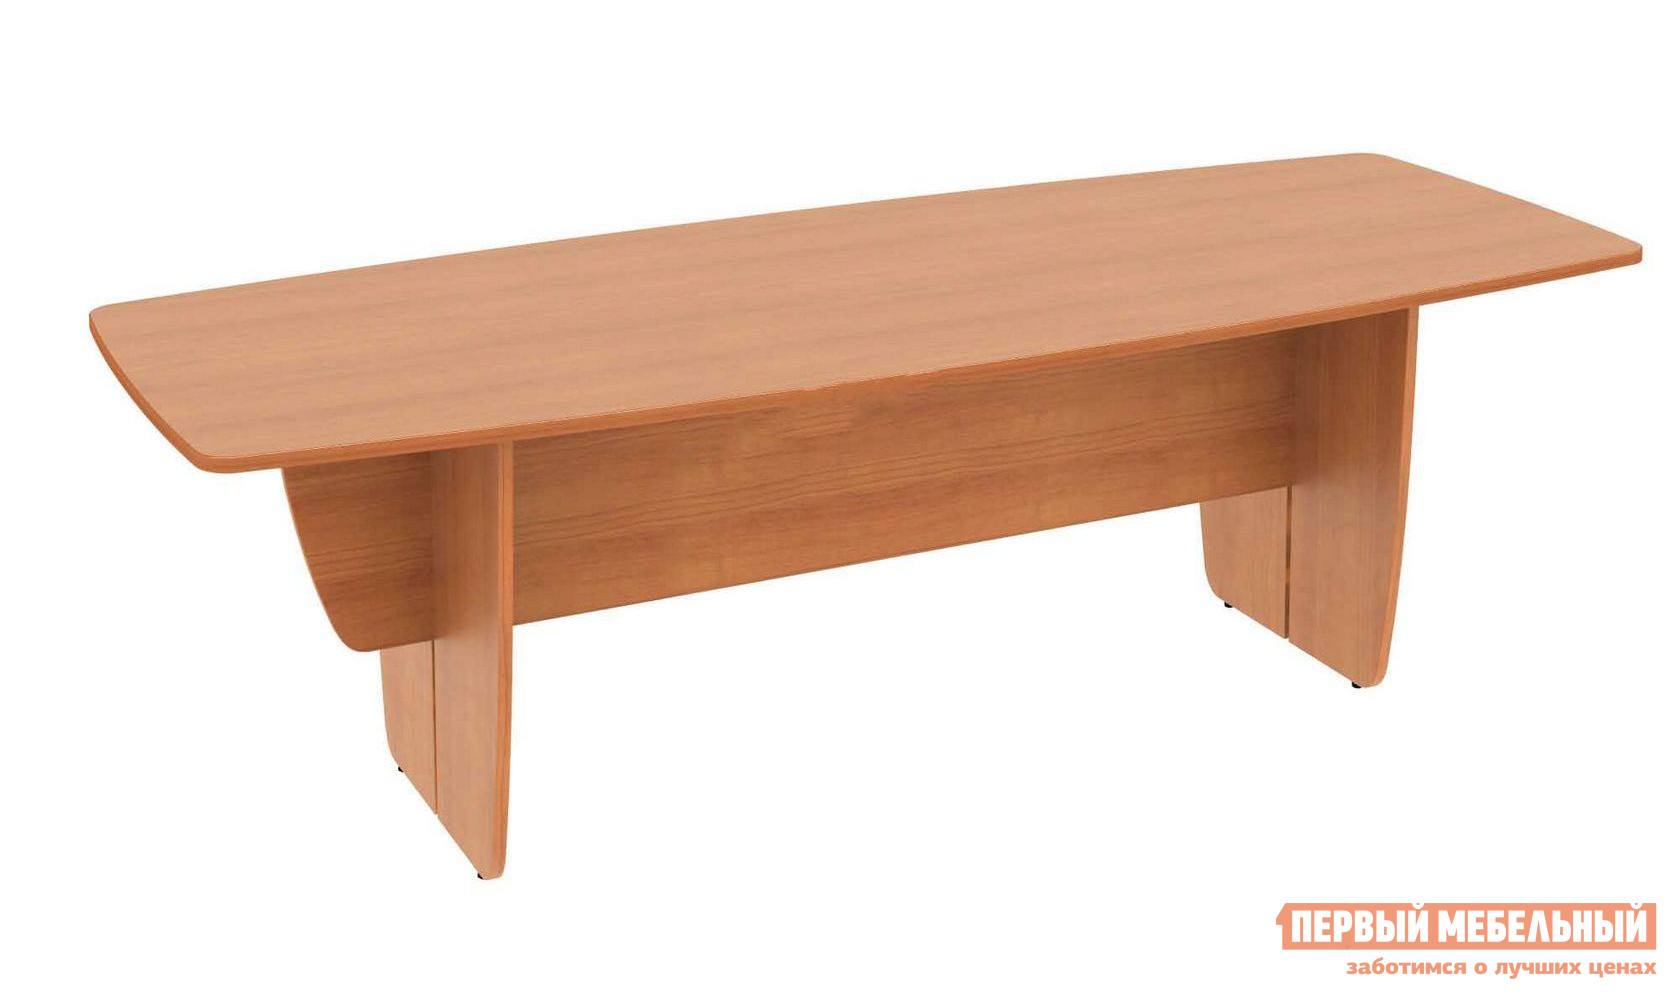 Стол для переговоров Витра 61(62).08 письменный стол витра 61 62 19